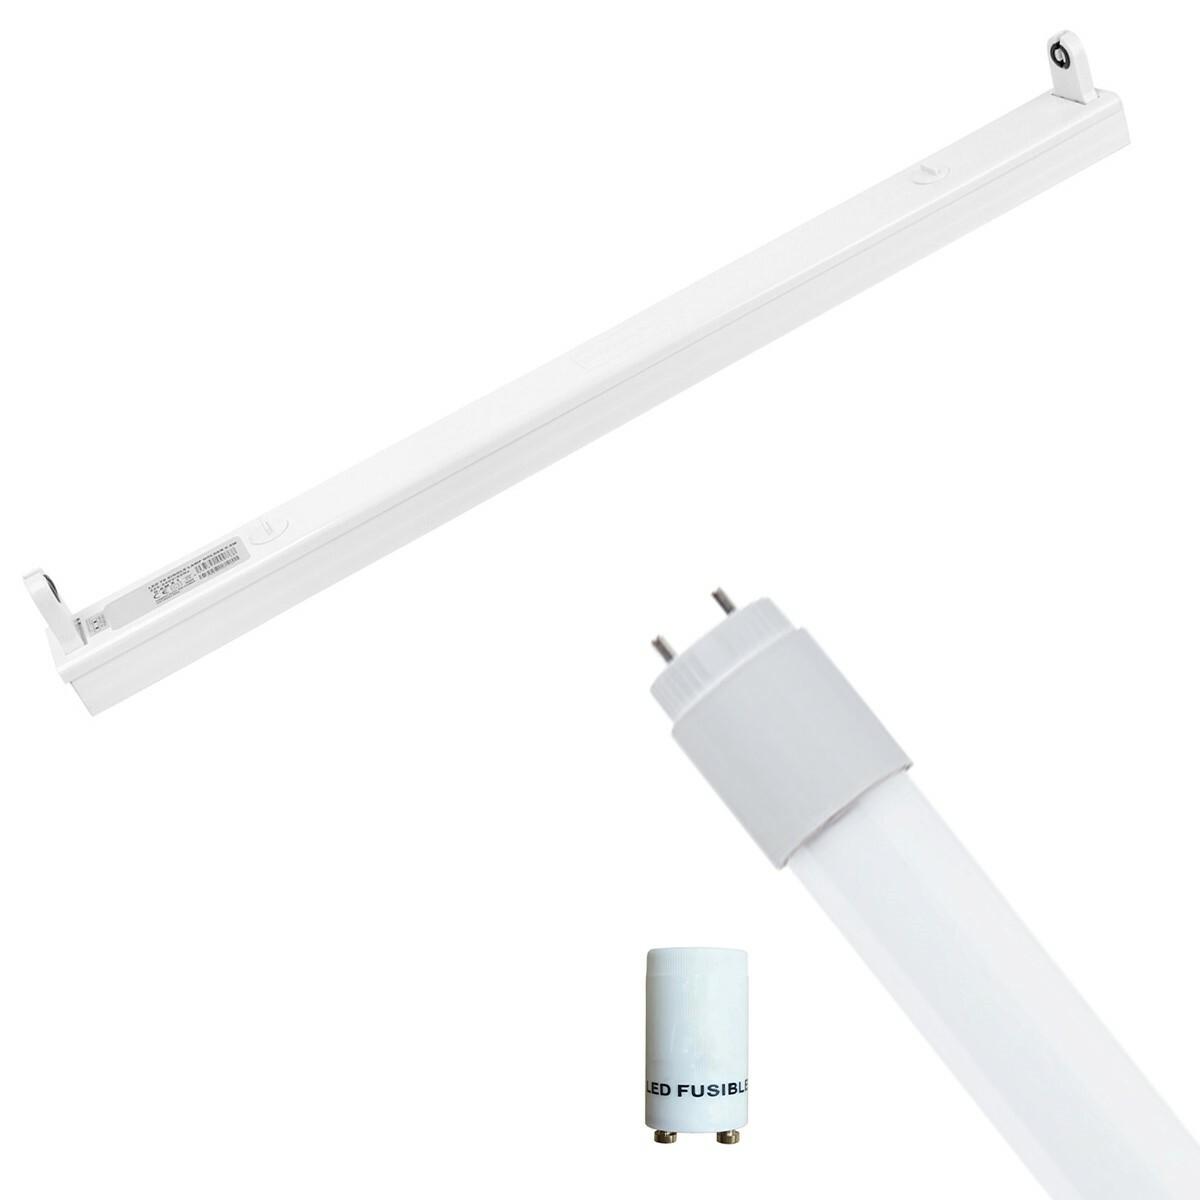 LED TL Armatuur met T8 Buis Incl. Starter - Aigi Dybolo - 60cm Enkel - 8W - Natuurlijk Wit 4200K - B